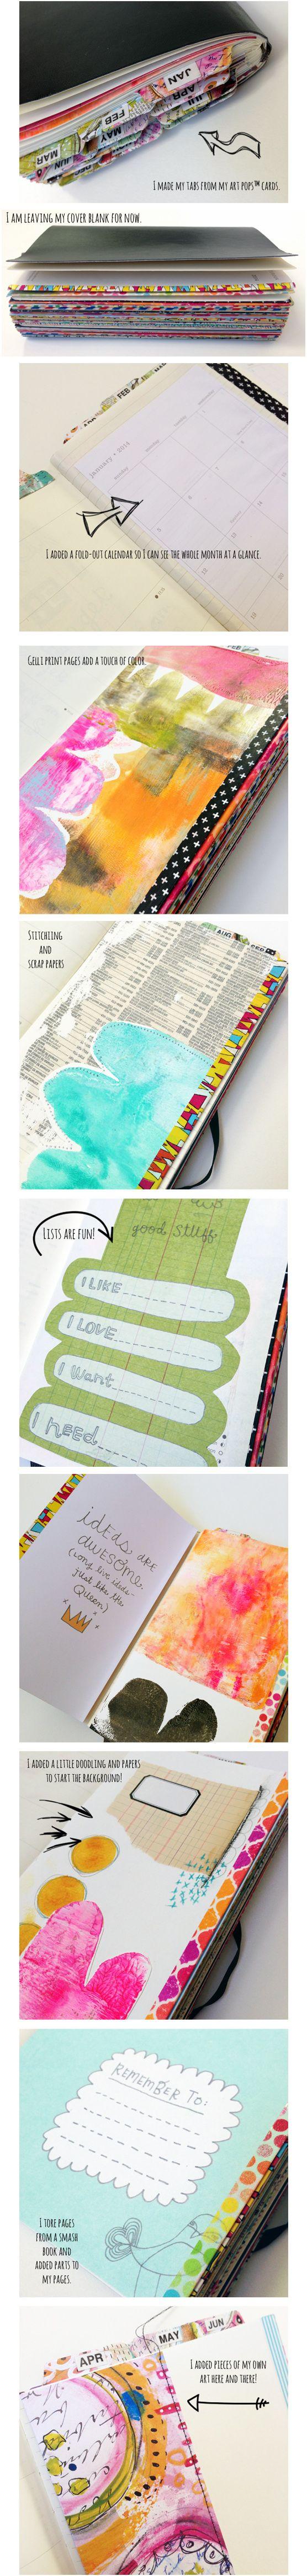 Muy buena idea para crear tu art journal